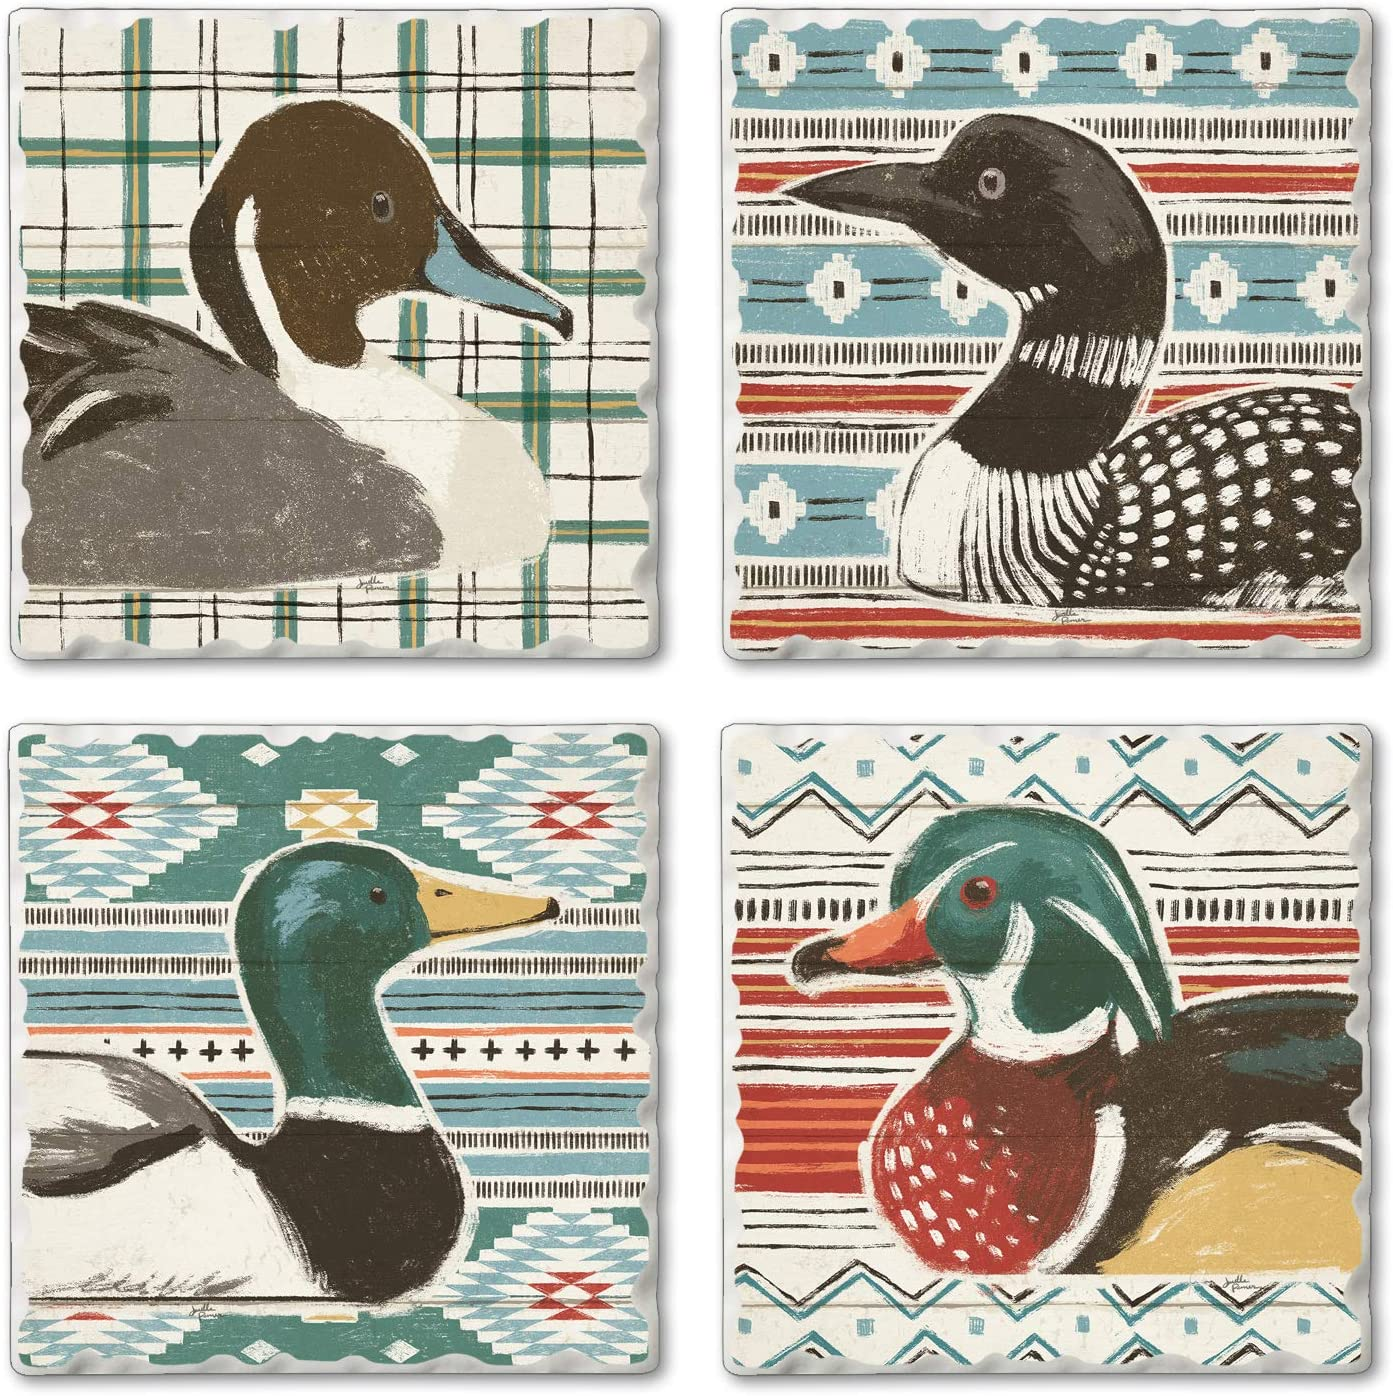 Duck Birthday ANIMAL BIRD CERAMIC art tile coaster